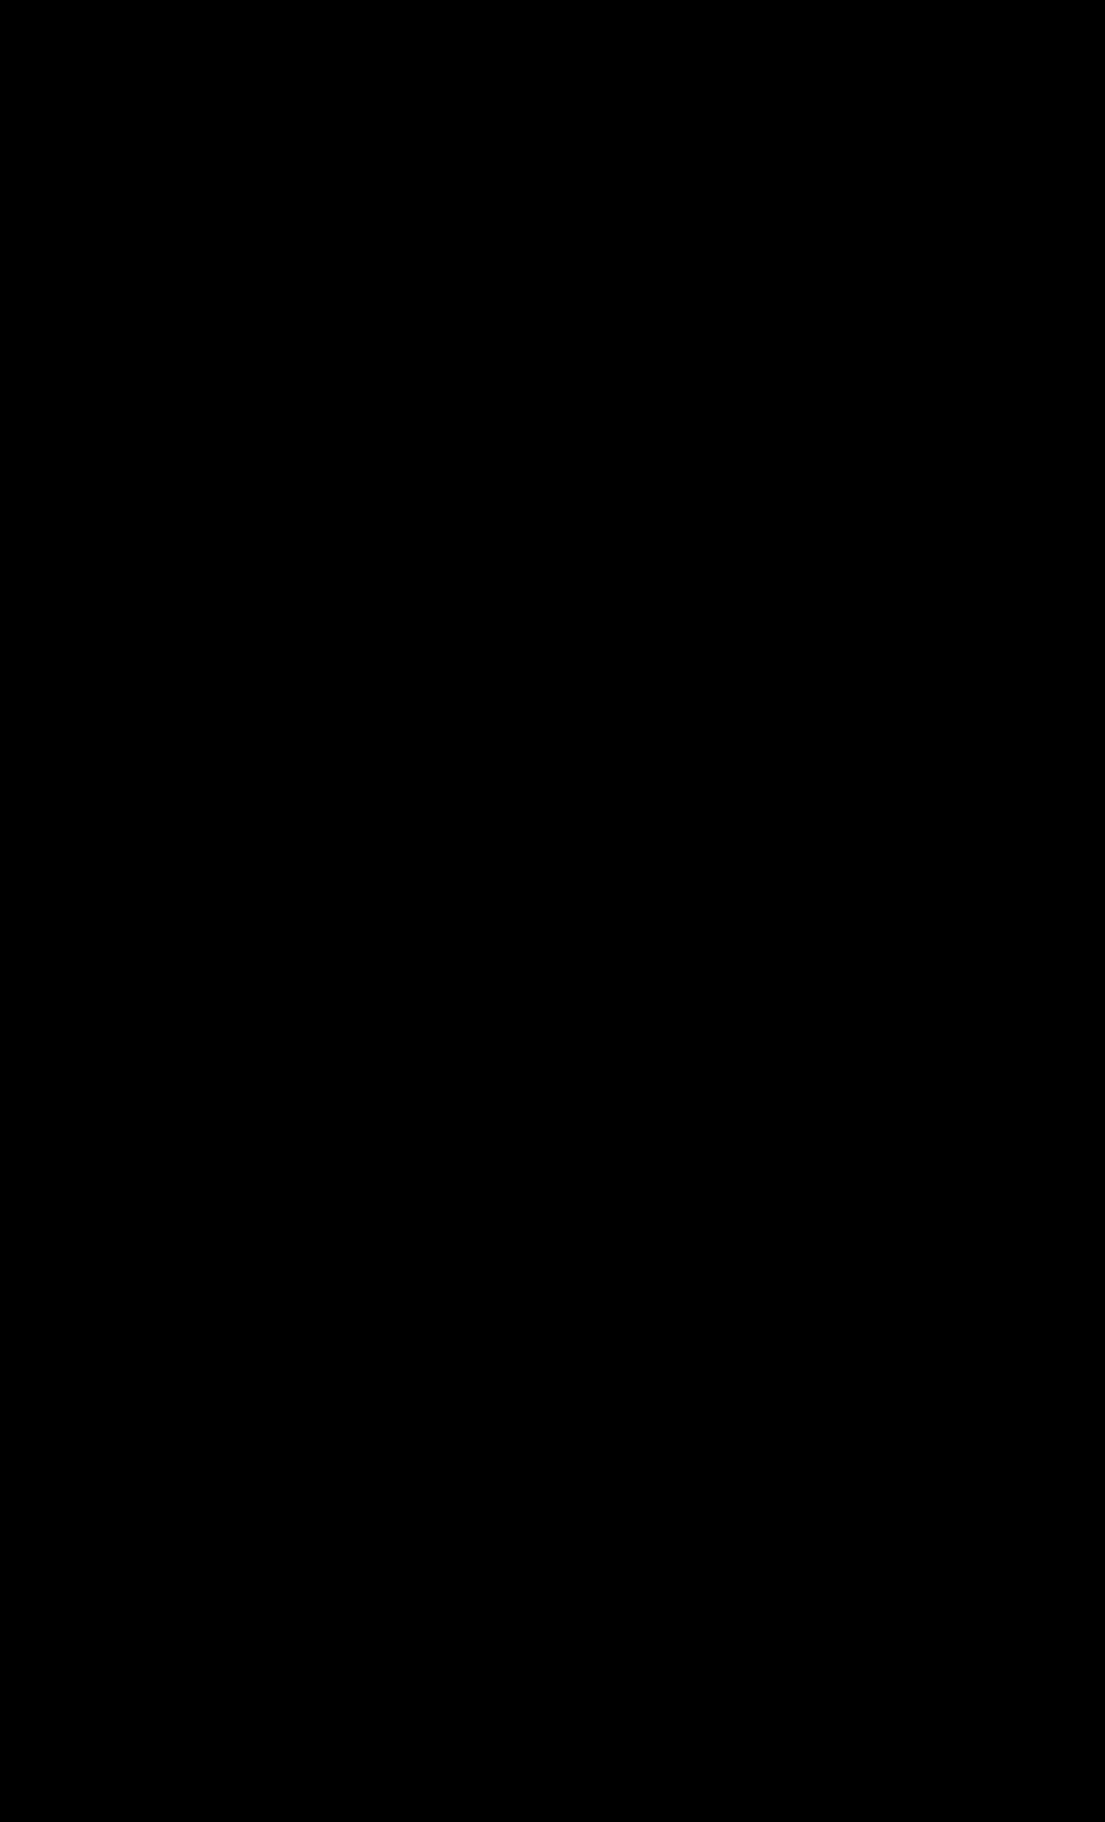 potinho 2